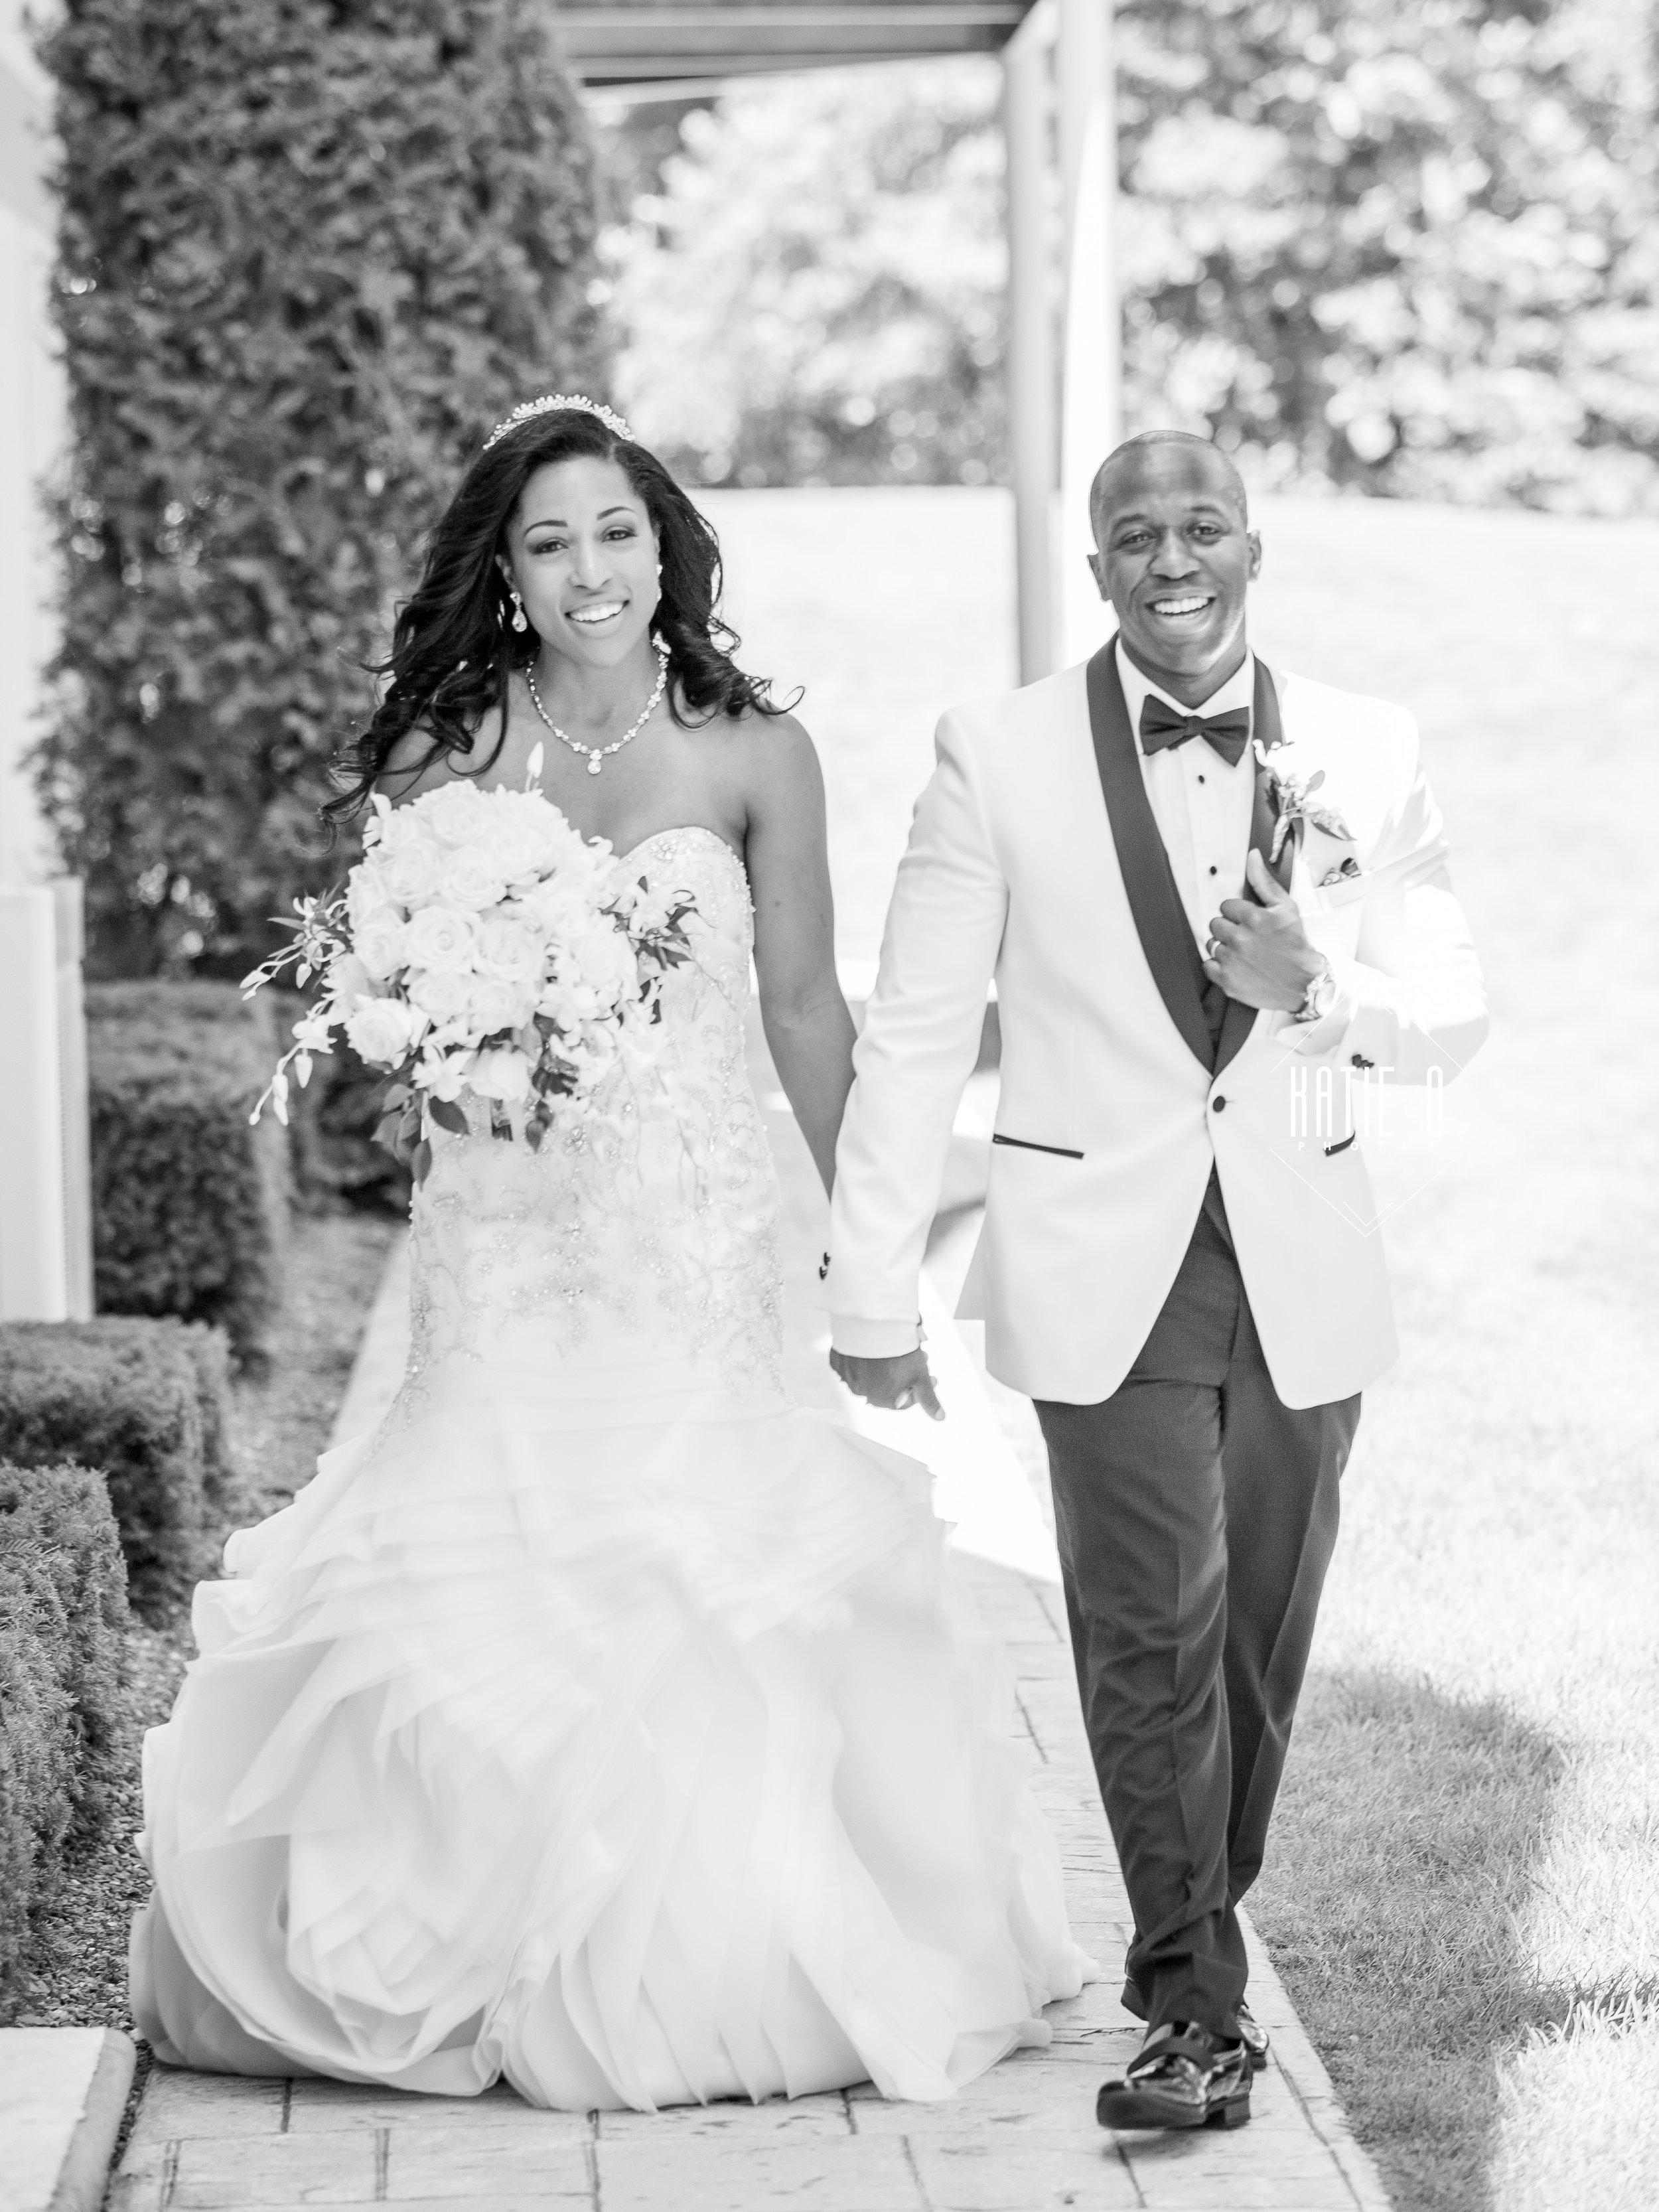 CT-WEDDING-PHOTOGRAPHER-BLOG-27.jpg